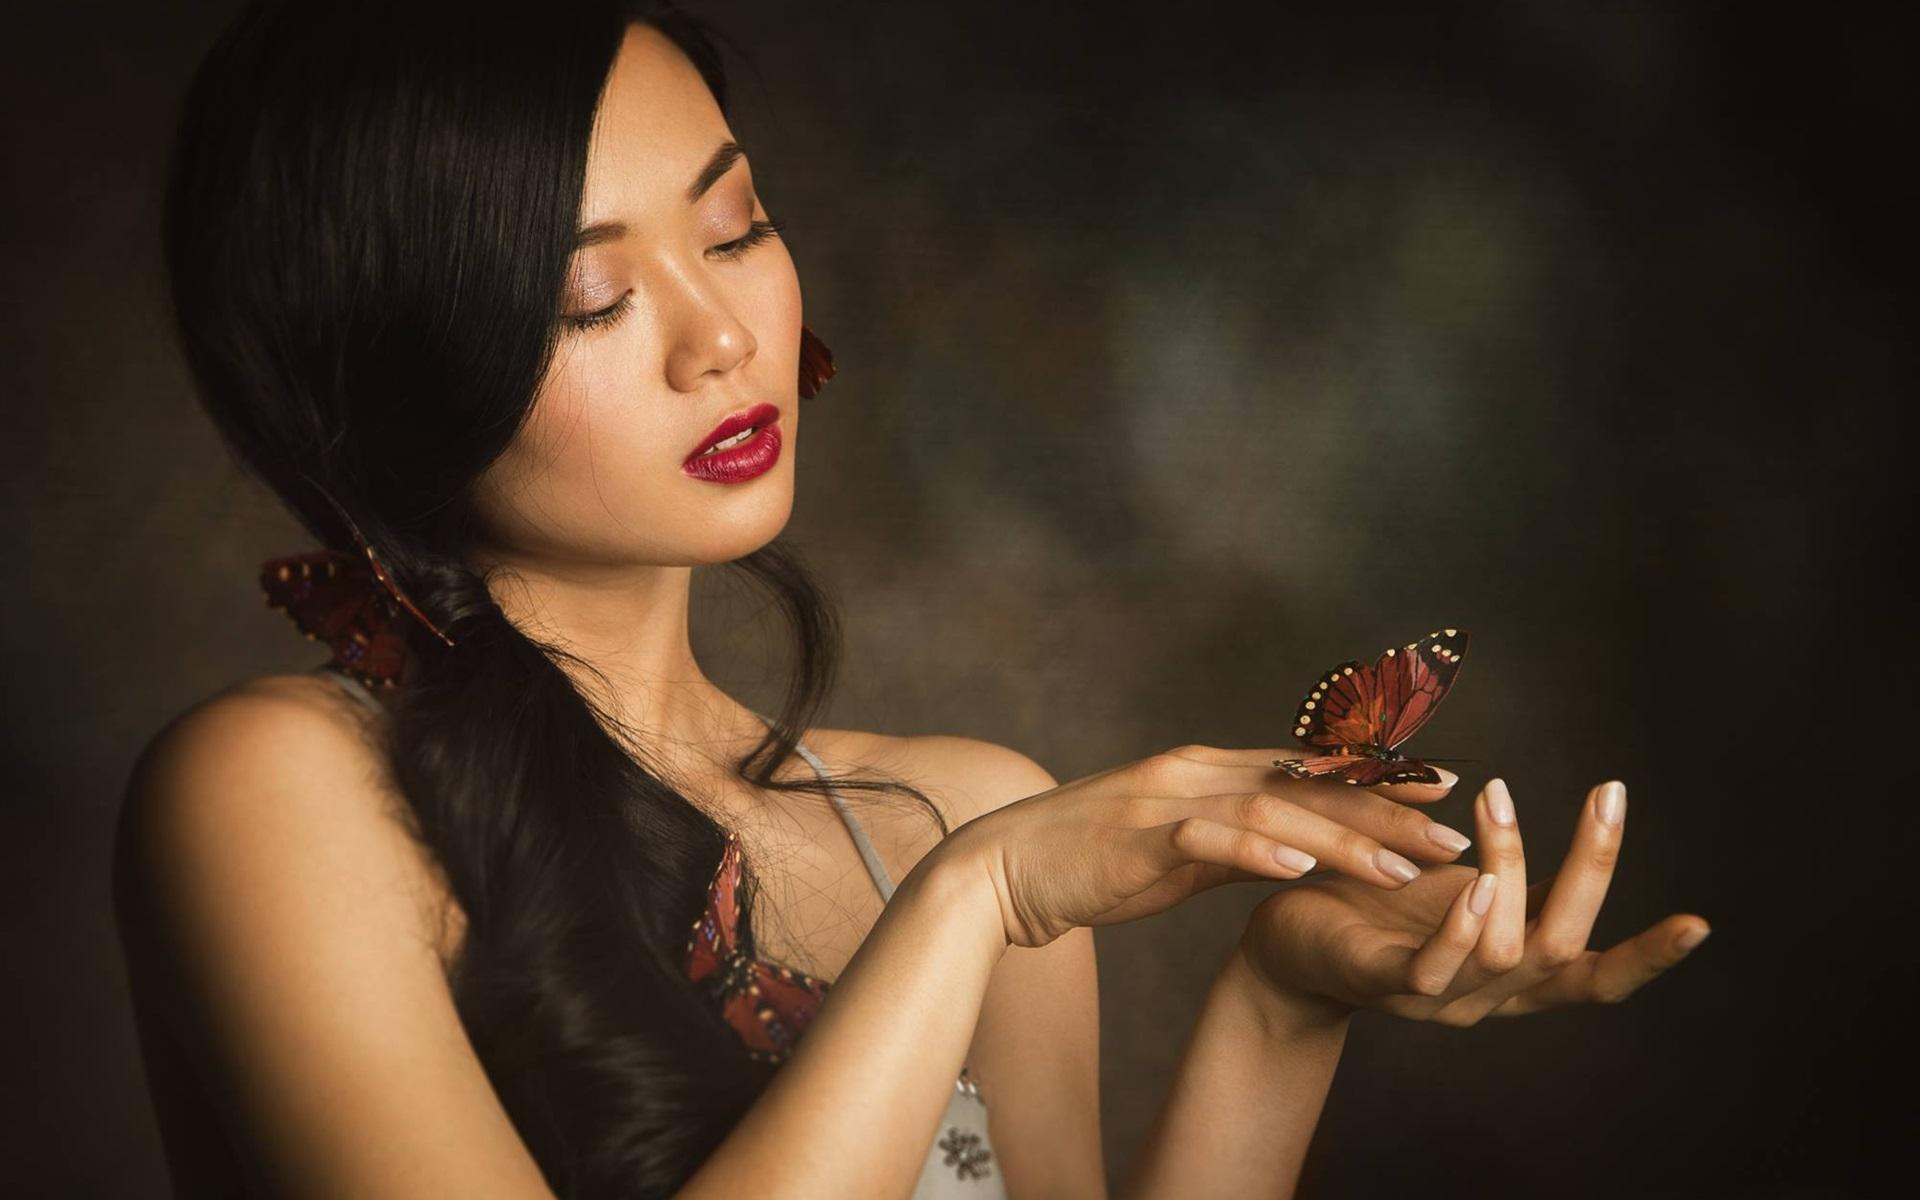 Девушка с бабочкой на ладони картинки